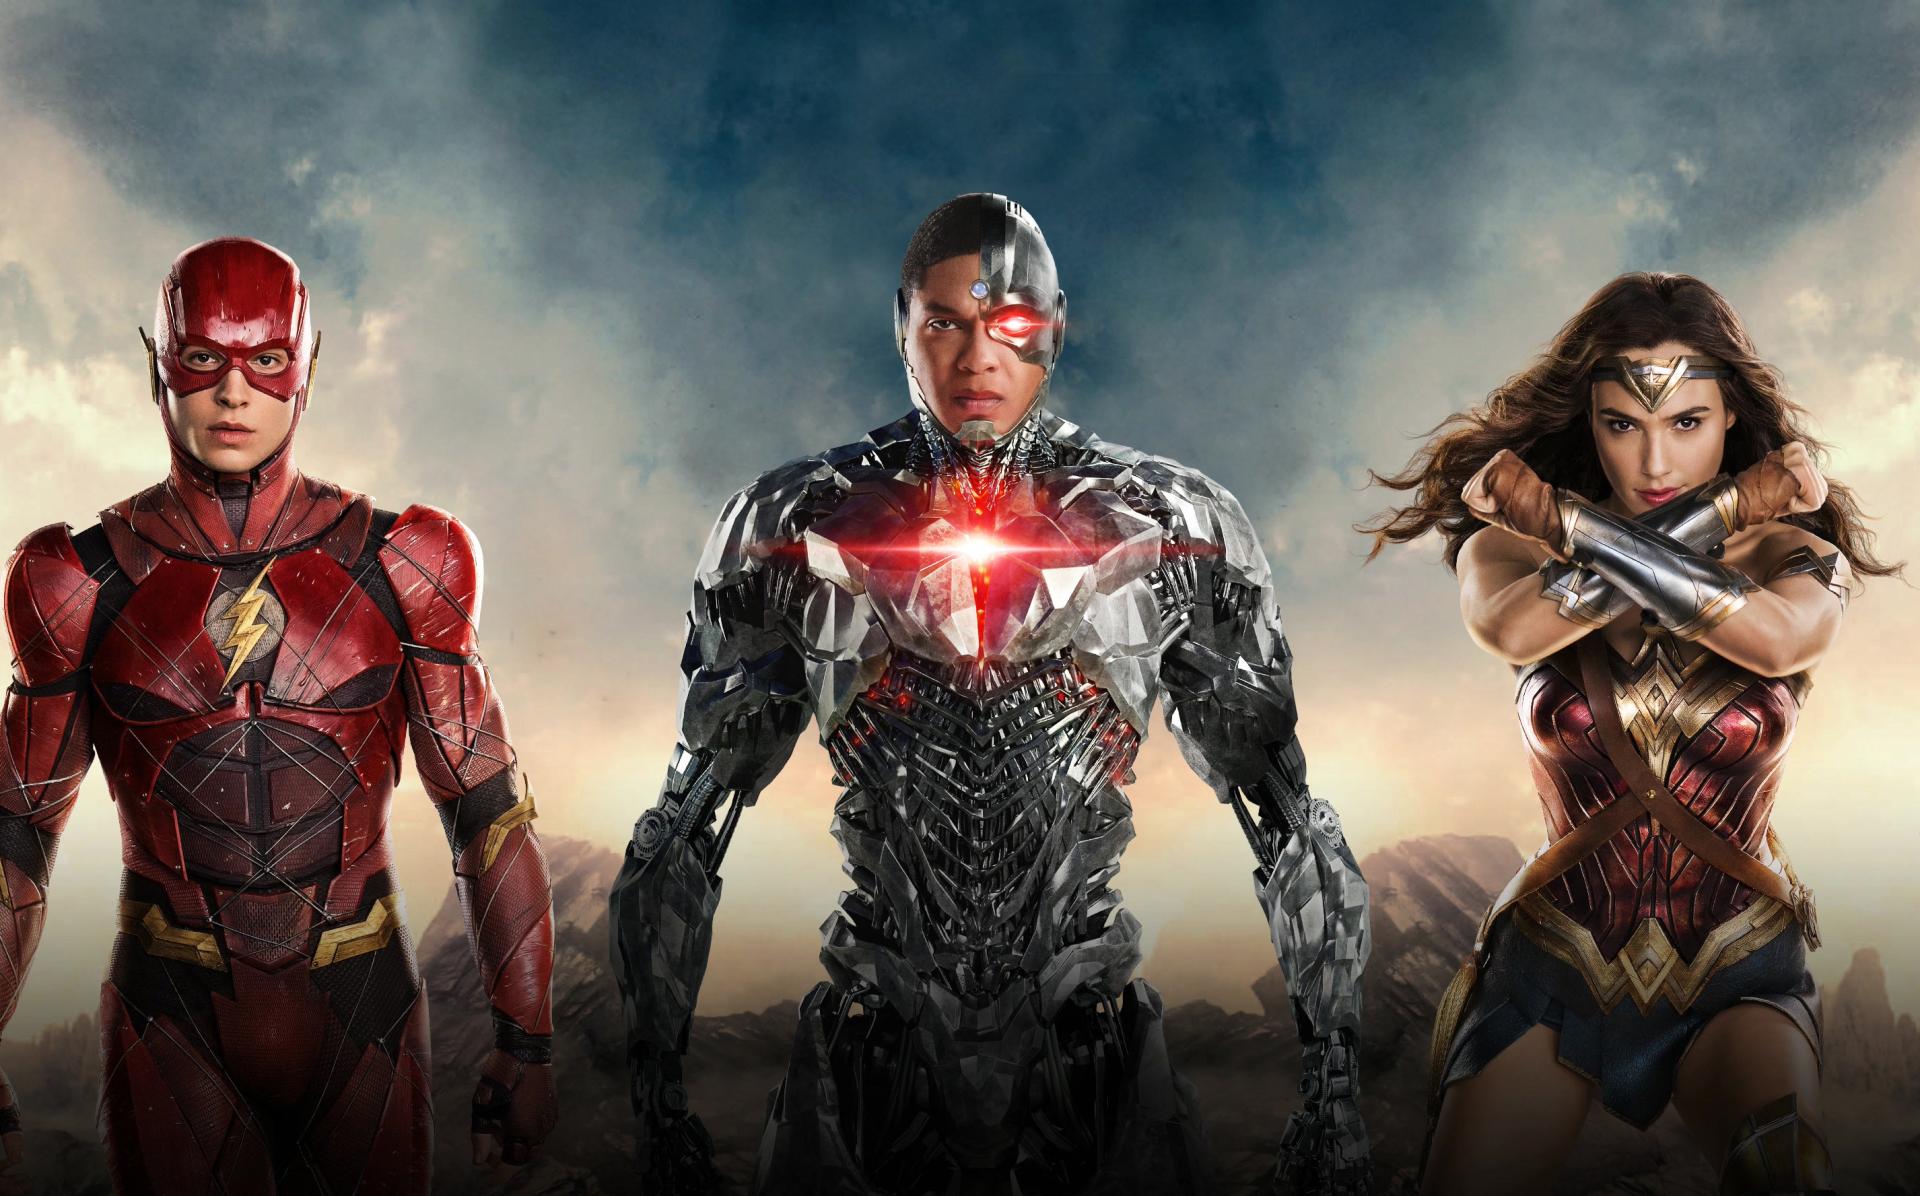 Wallpaper Justice League 2017 Movies Flash Superman: Justice League HD Wallpaper